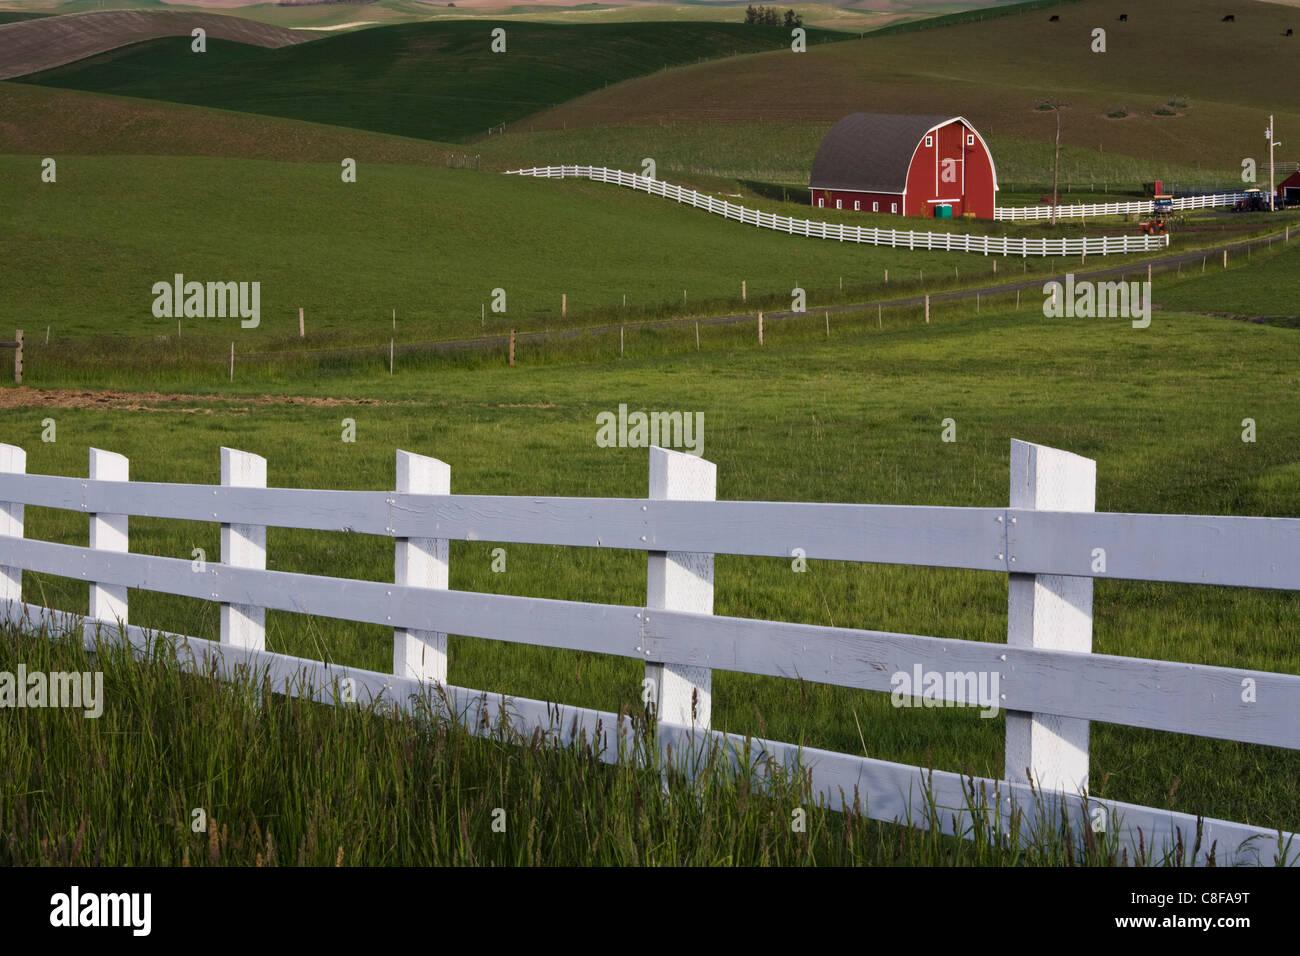 Barn in the Palouse, Washington State, United States of America - Stock Image